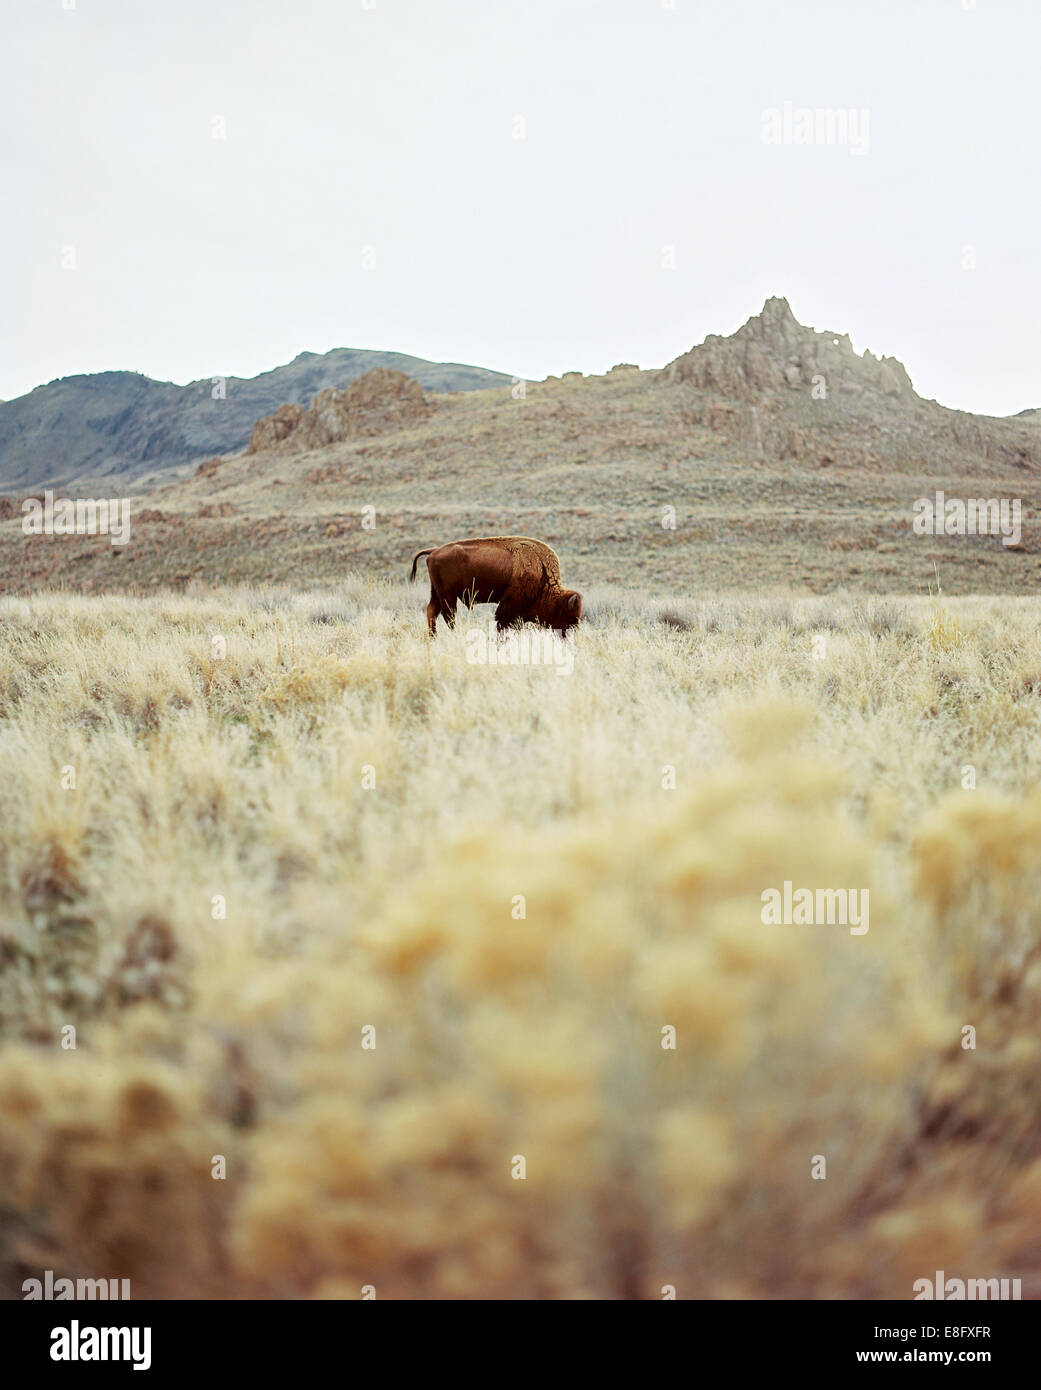 USA, Utah, einsame Büffel grasen auf Rasen Stockbild